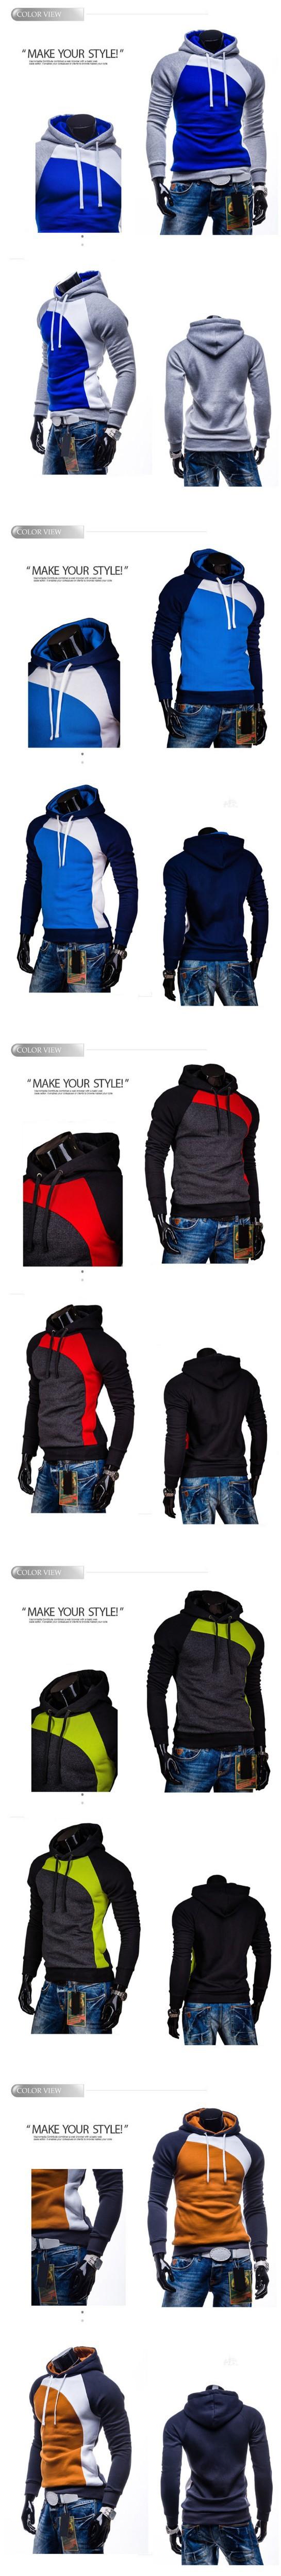 8-2015 New Arrival Hoodies Men Solid Color Fashion chandal hombre sudaderas sweatshirt men